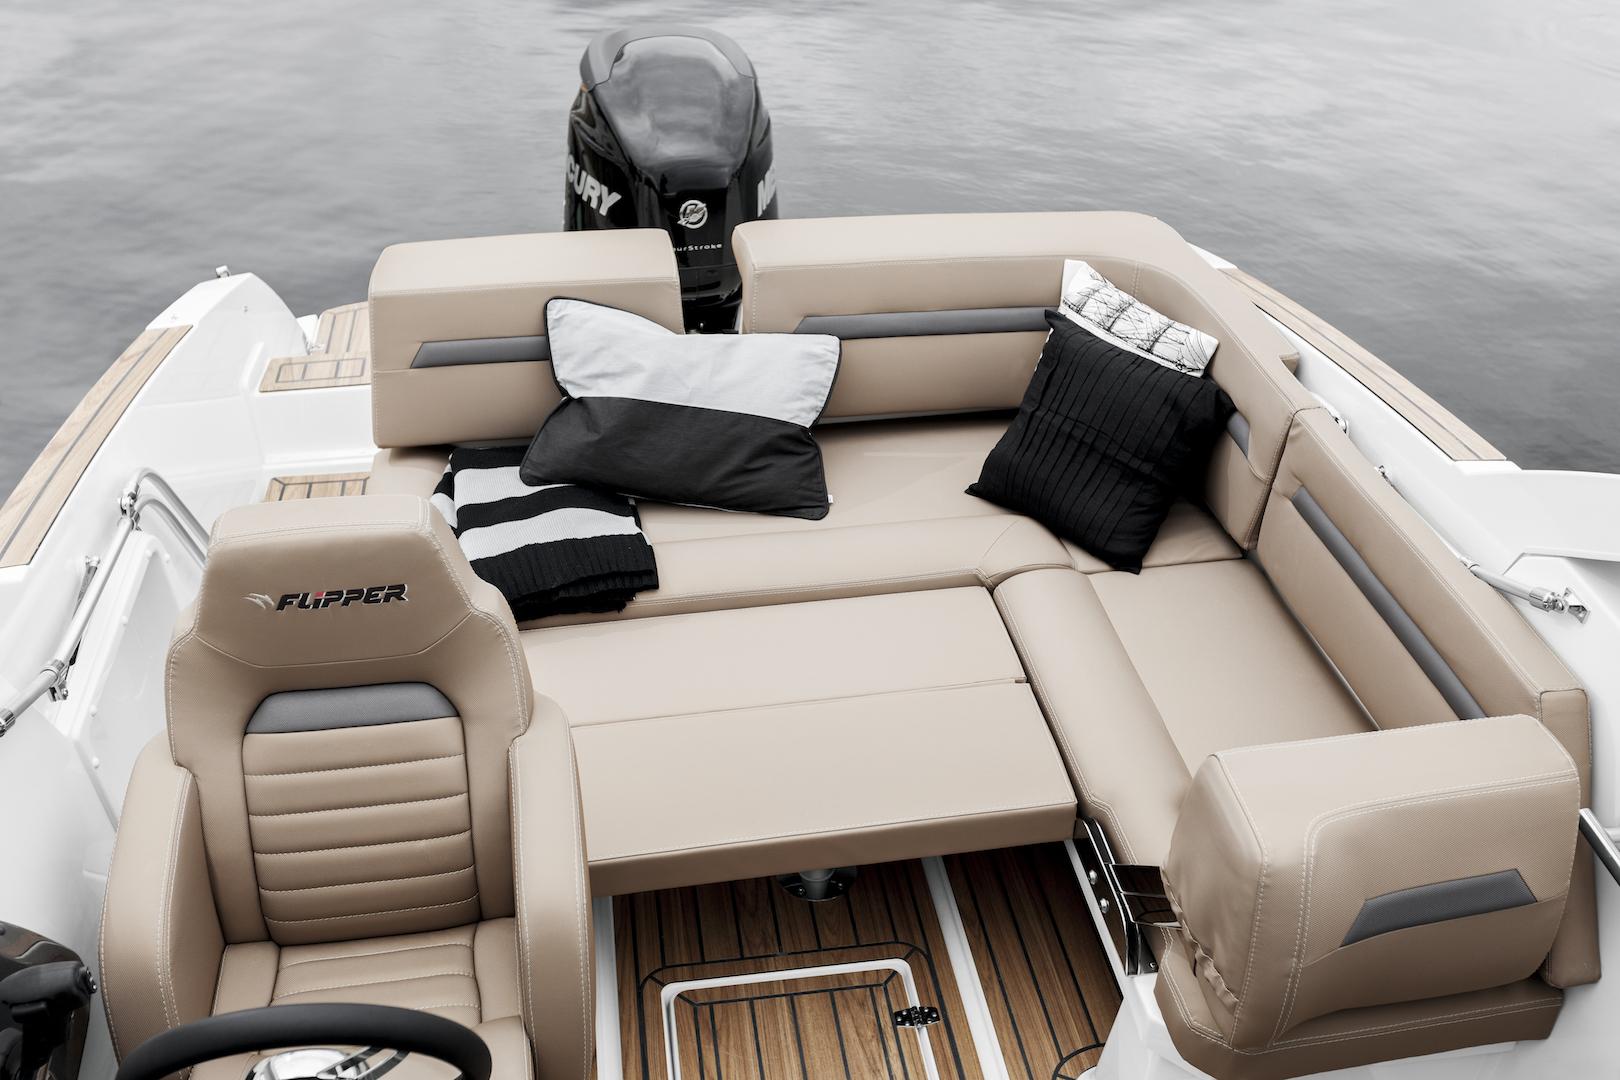 Flipper 700 Sport Top aft bed up